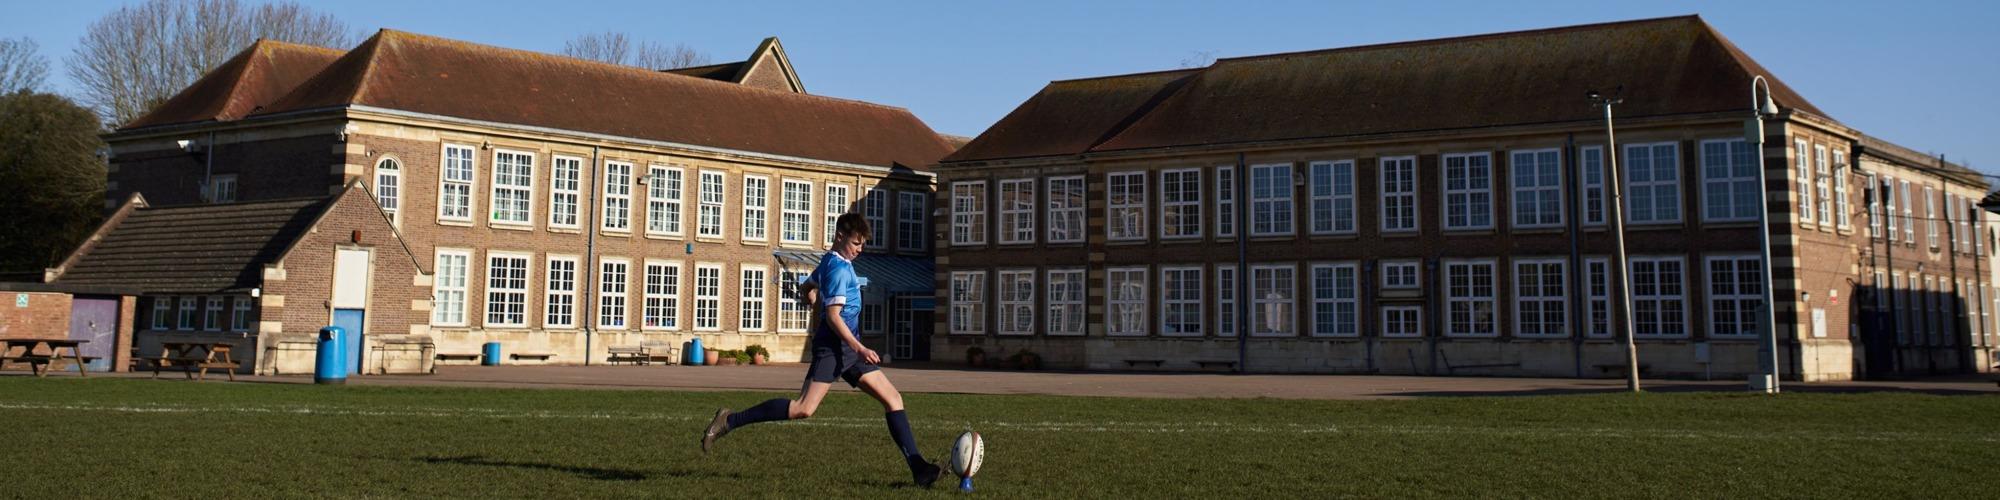 20 02 12.Chiswick School.1045 (web)